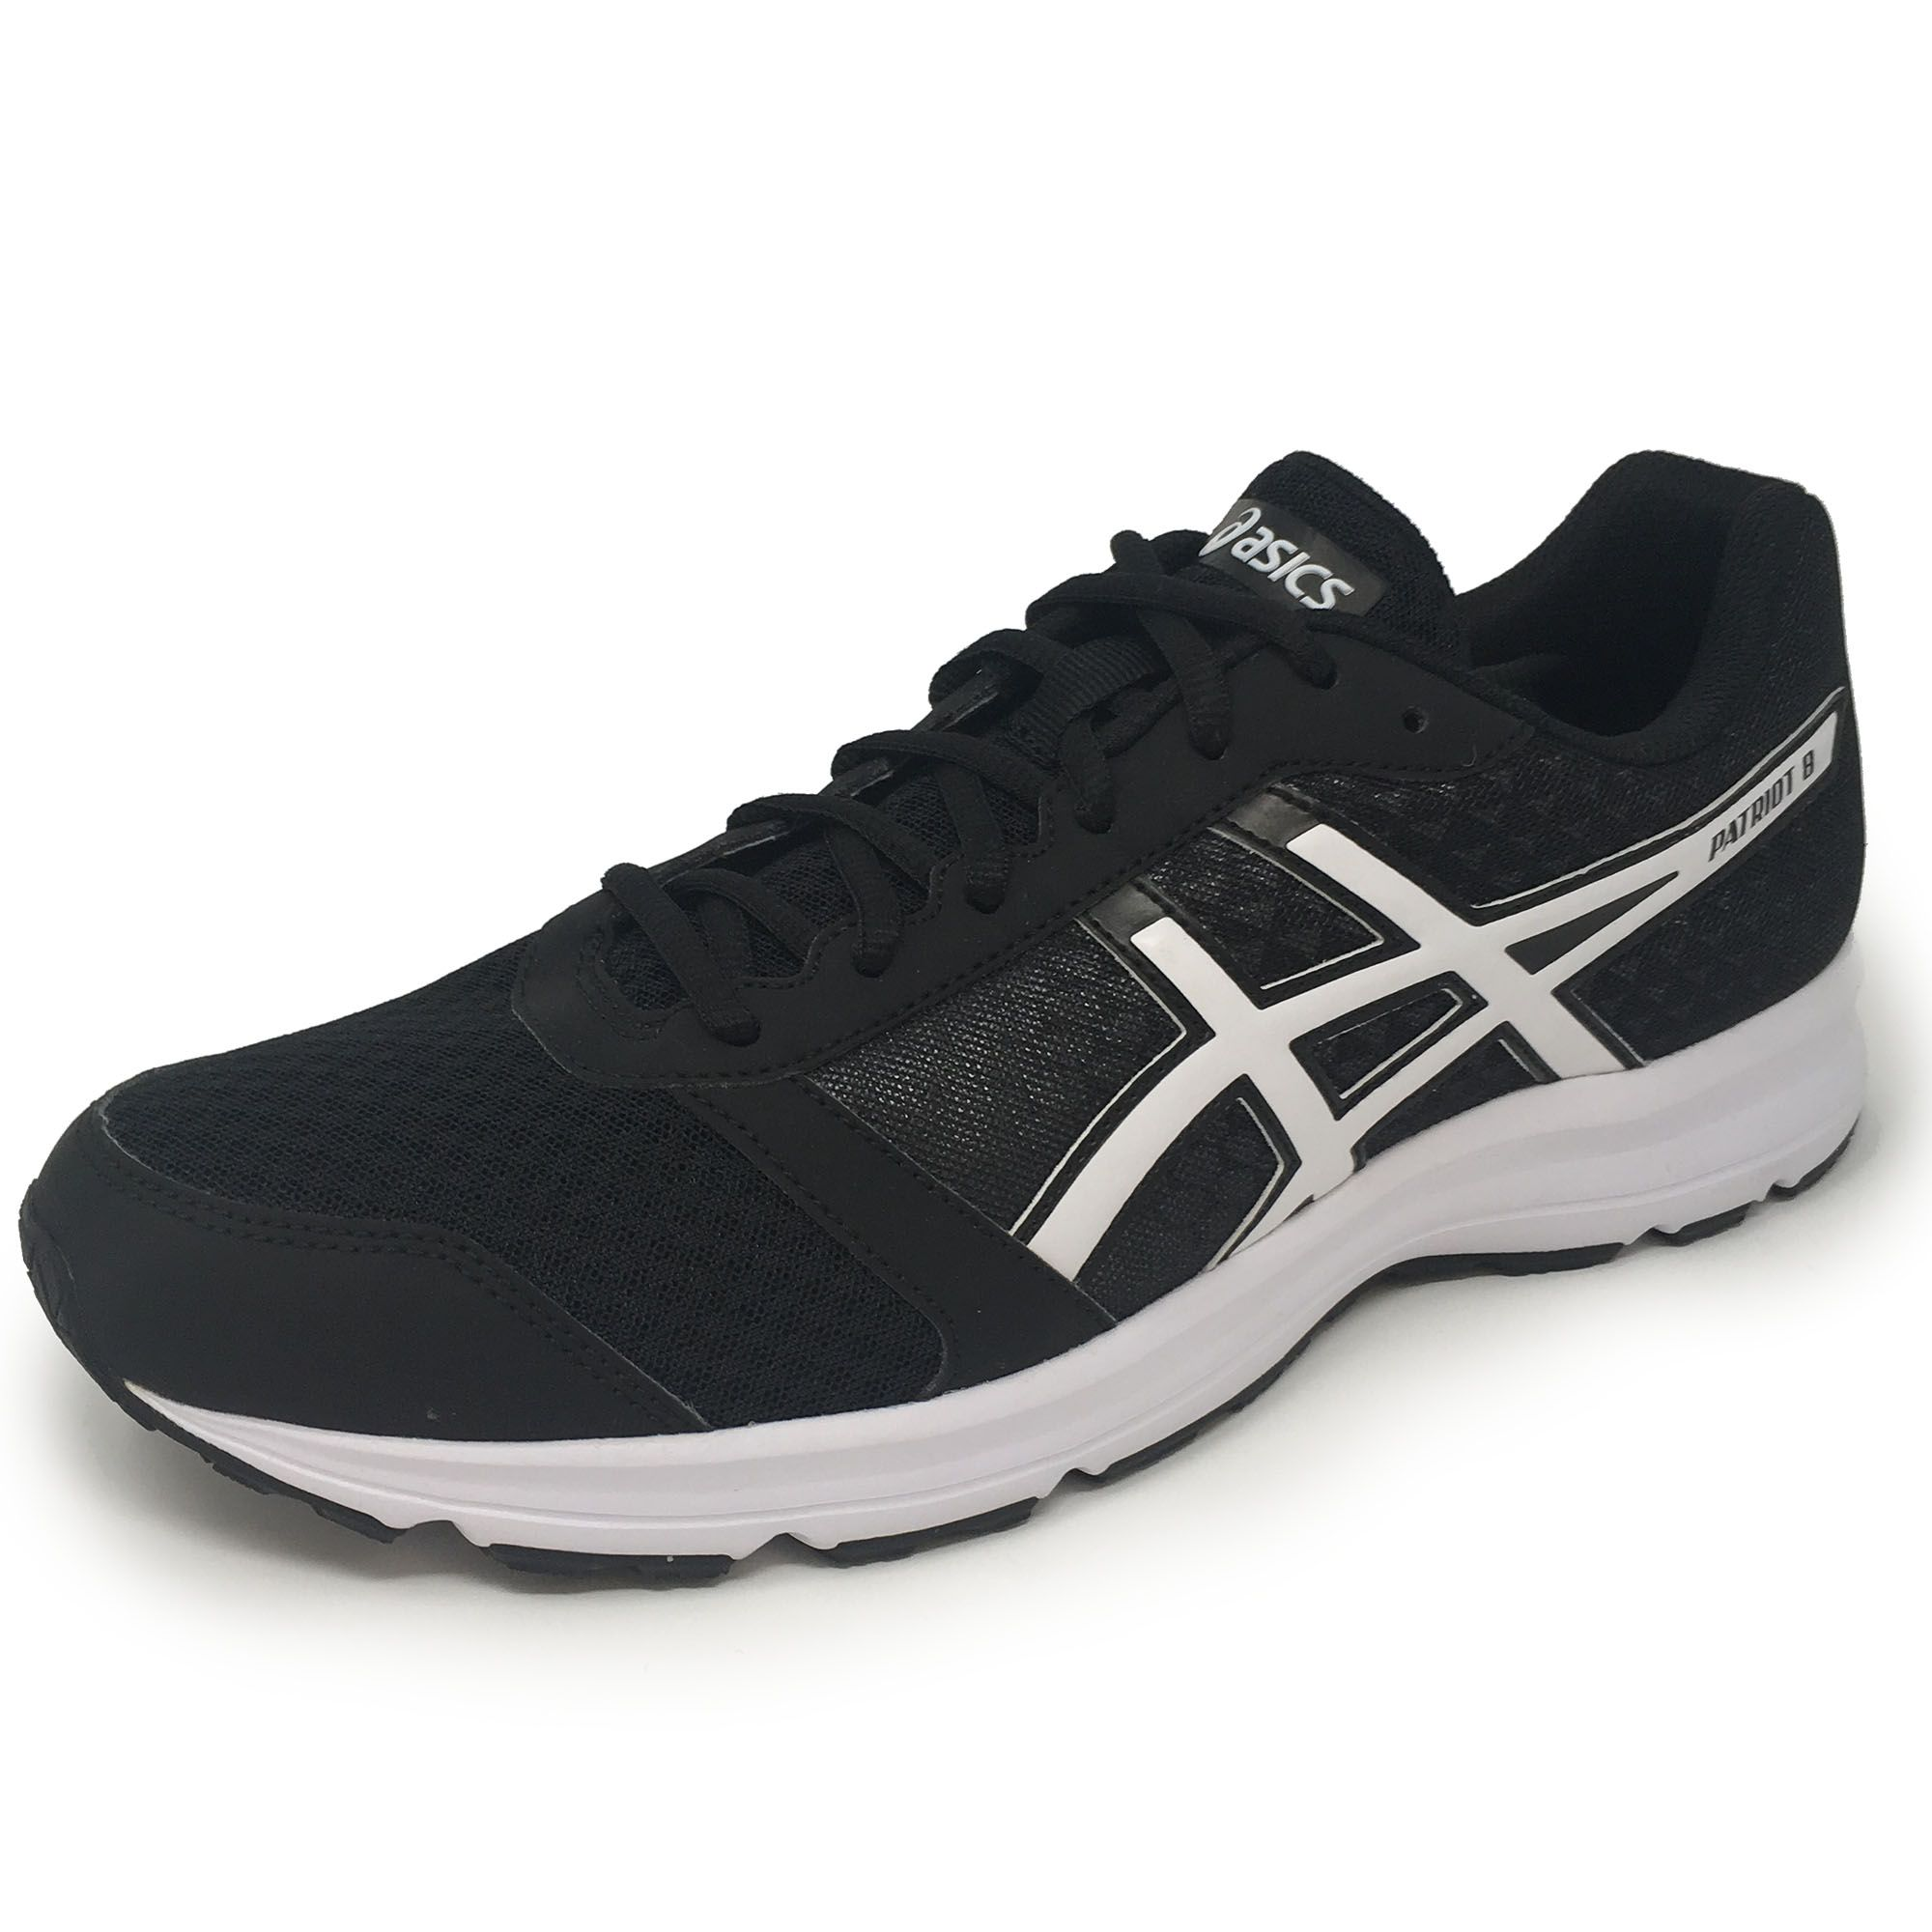 Asics Patriot 8 Mens Running Shoes - Sweatband.com